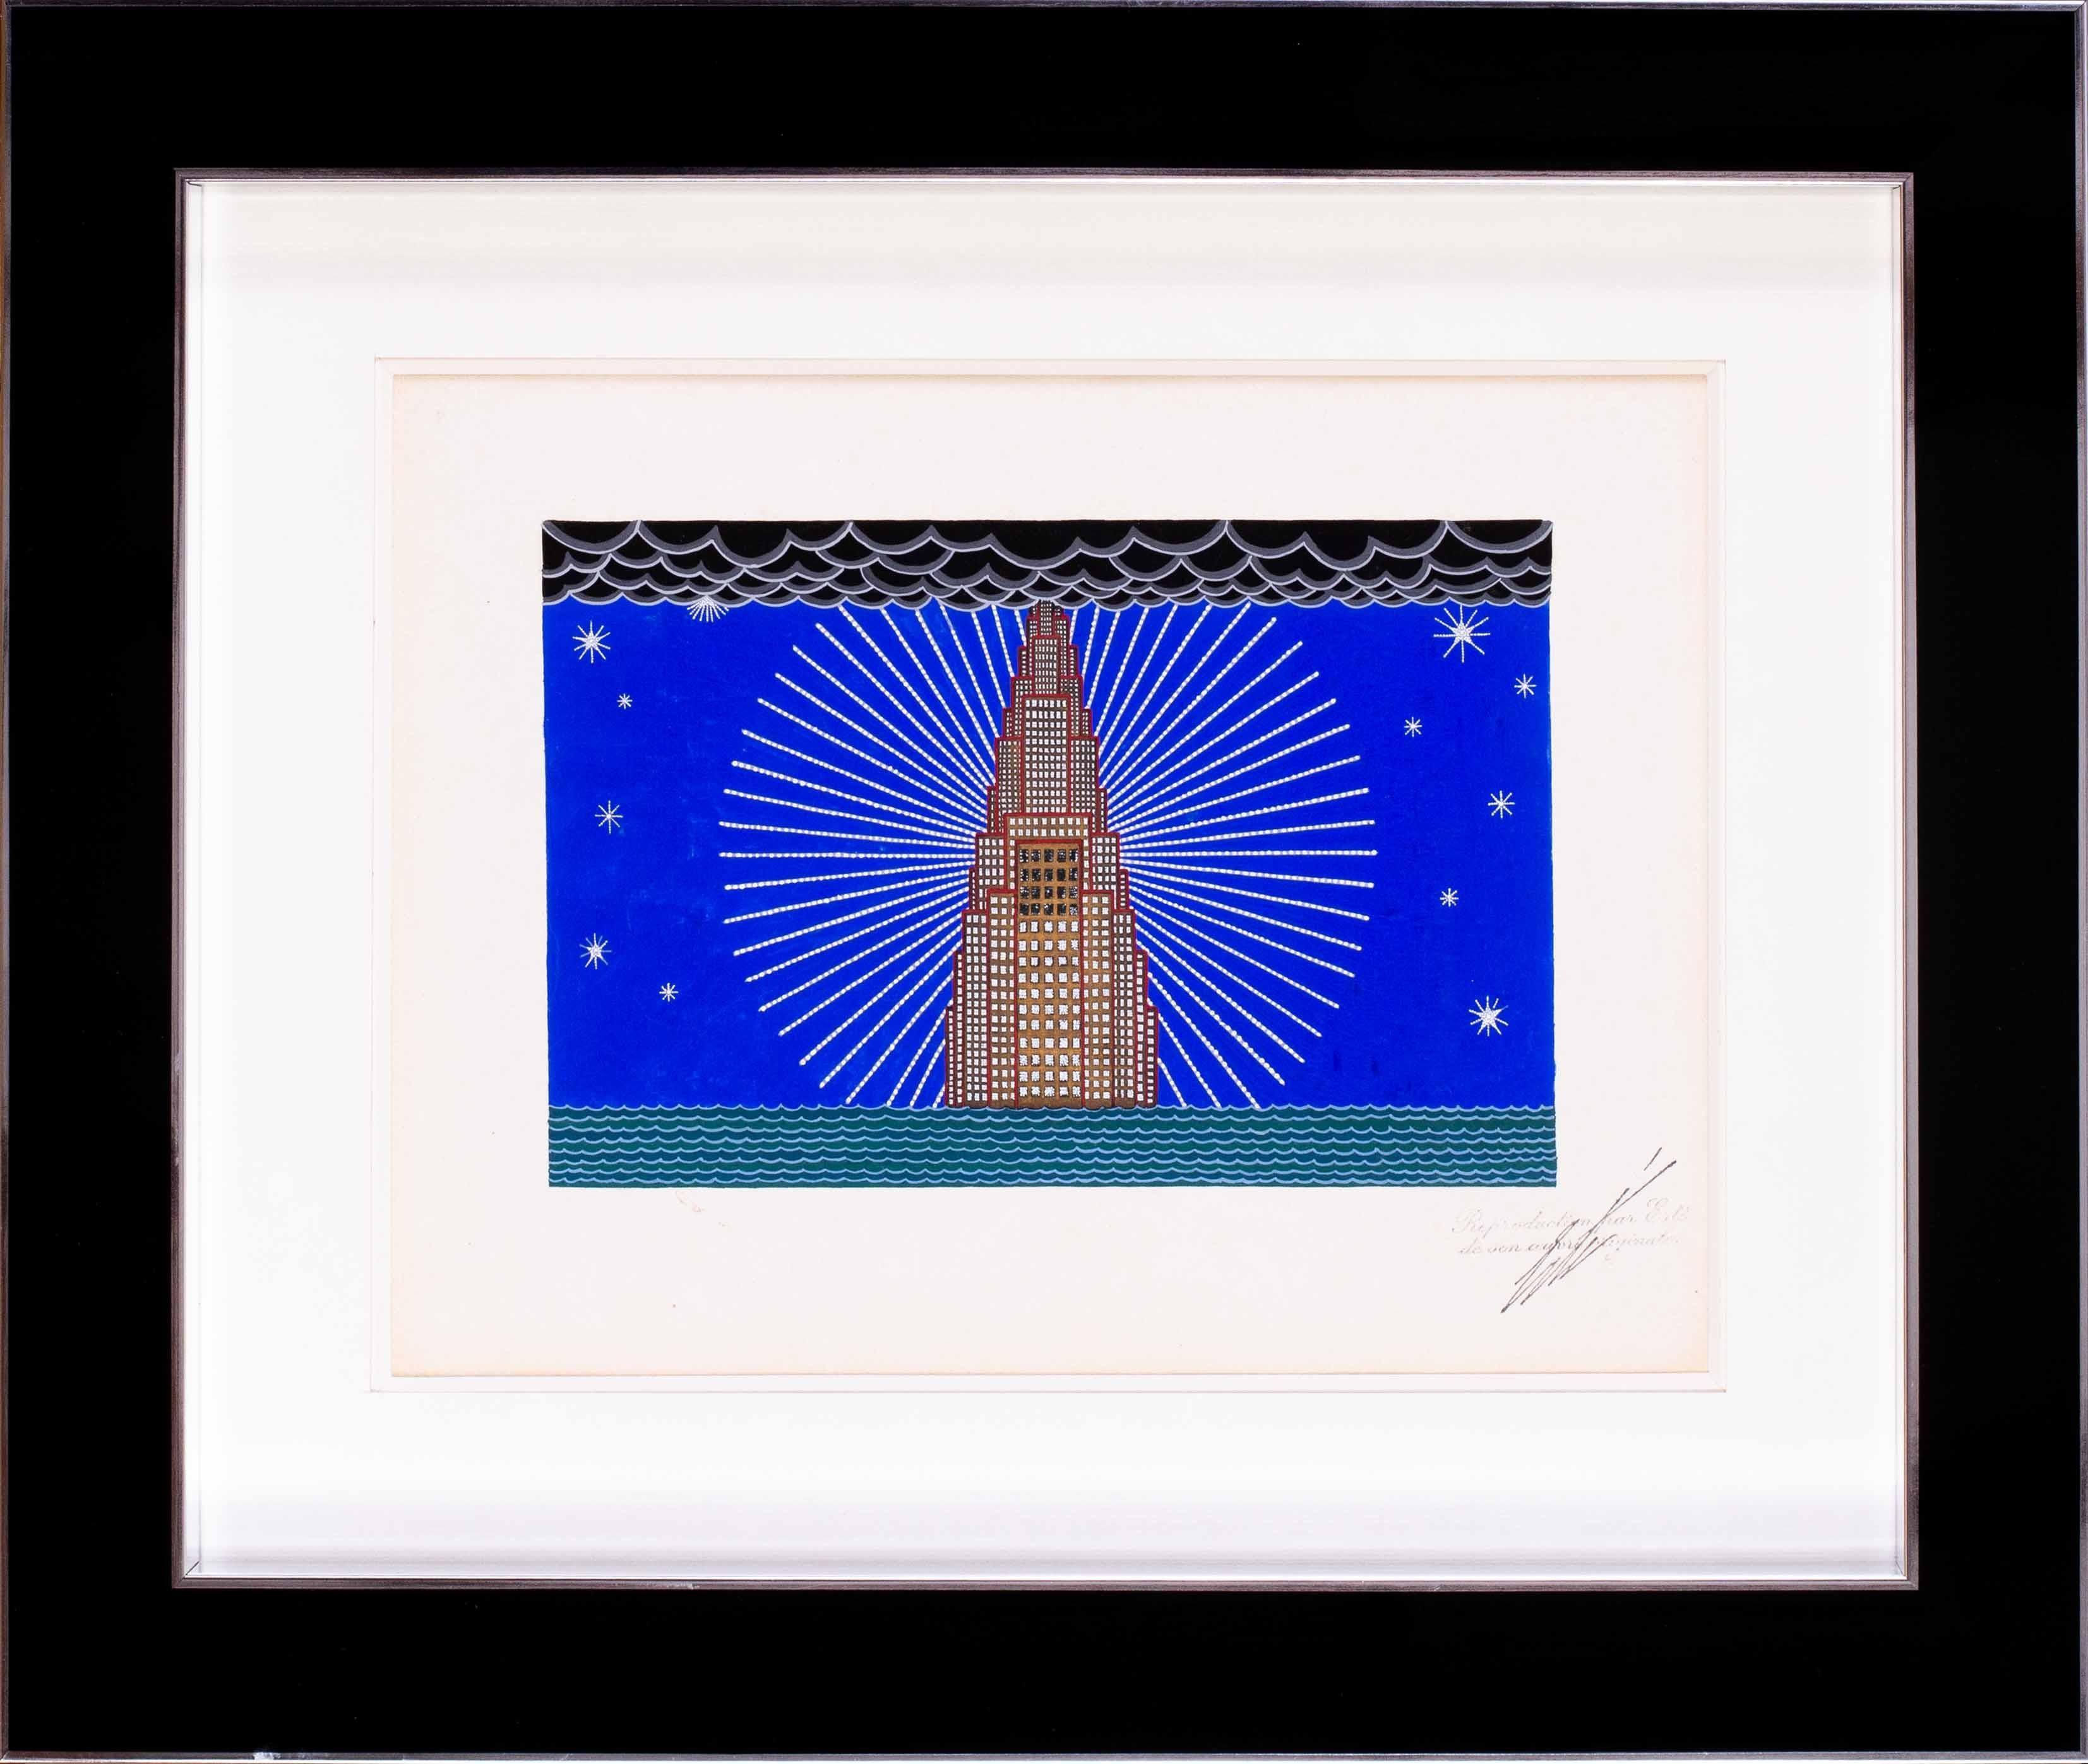 Erte, 'New York, a study for a curtain in the Operetta Manhattan Mary', art deco